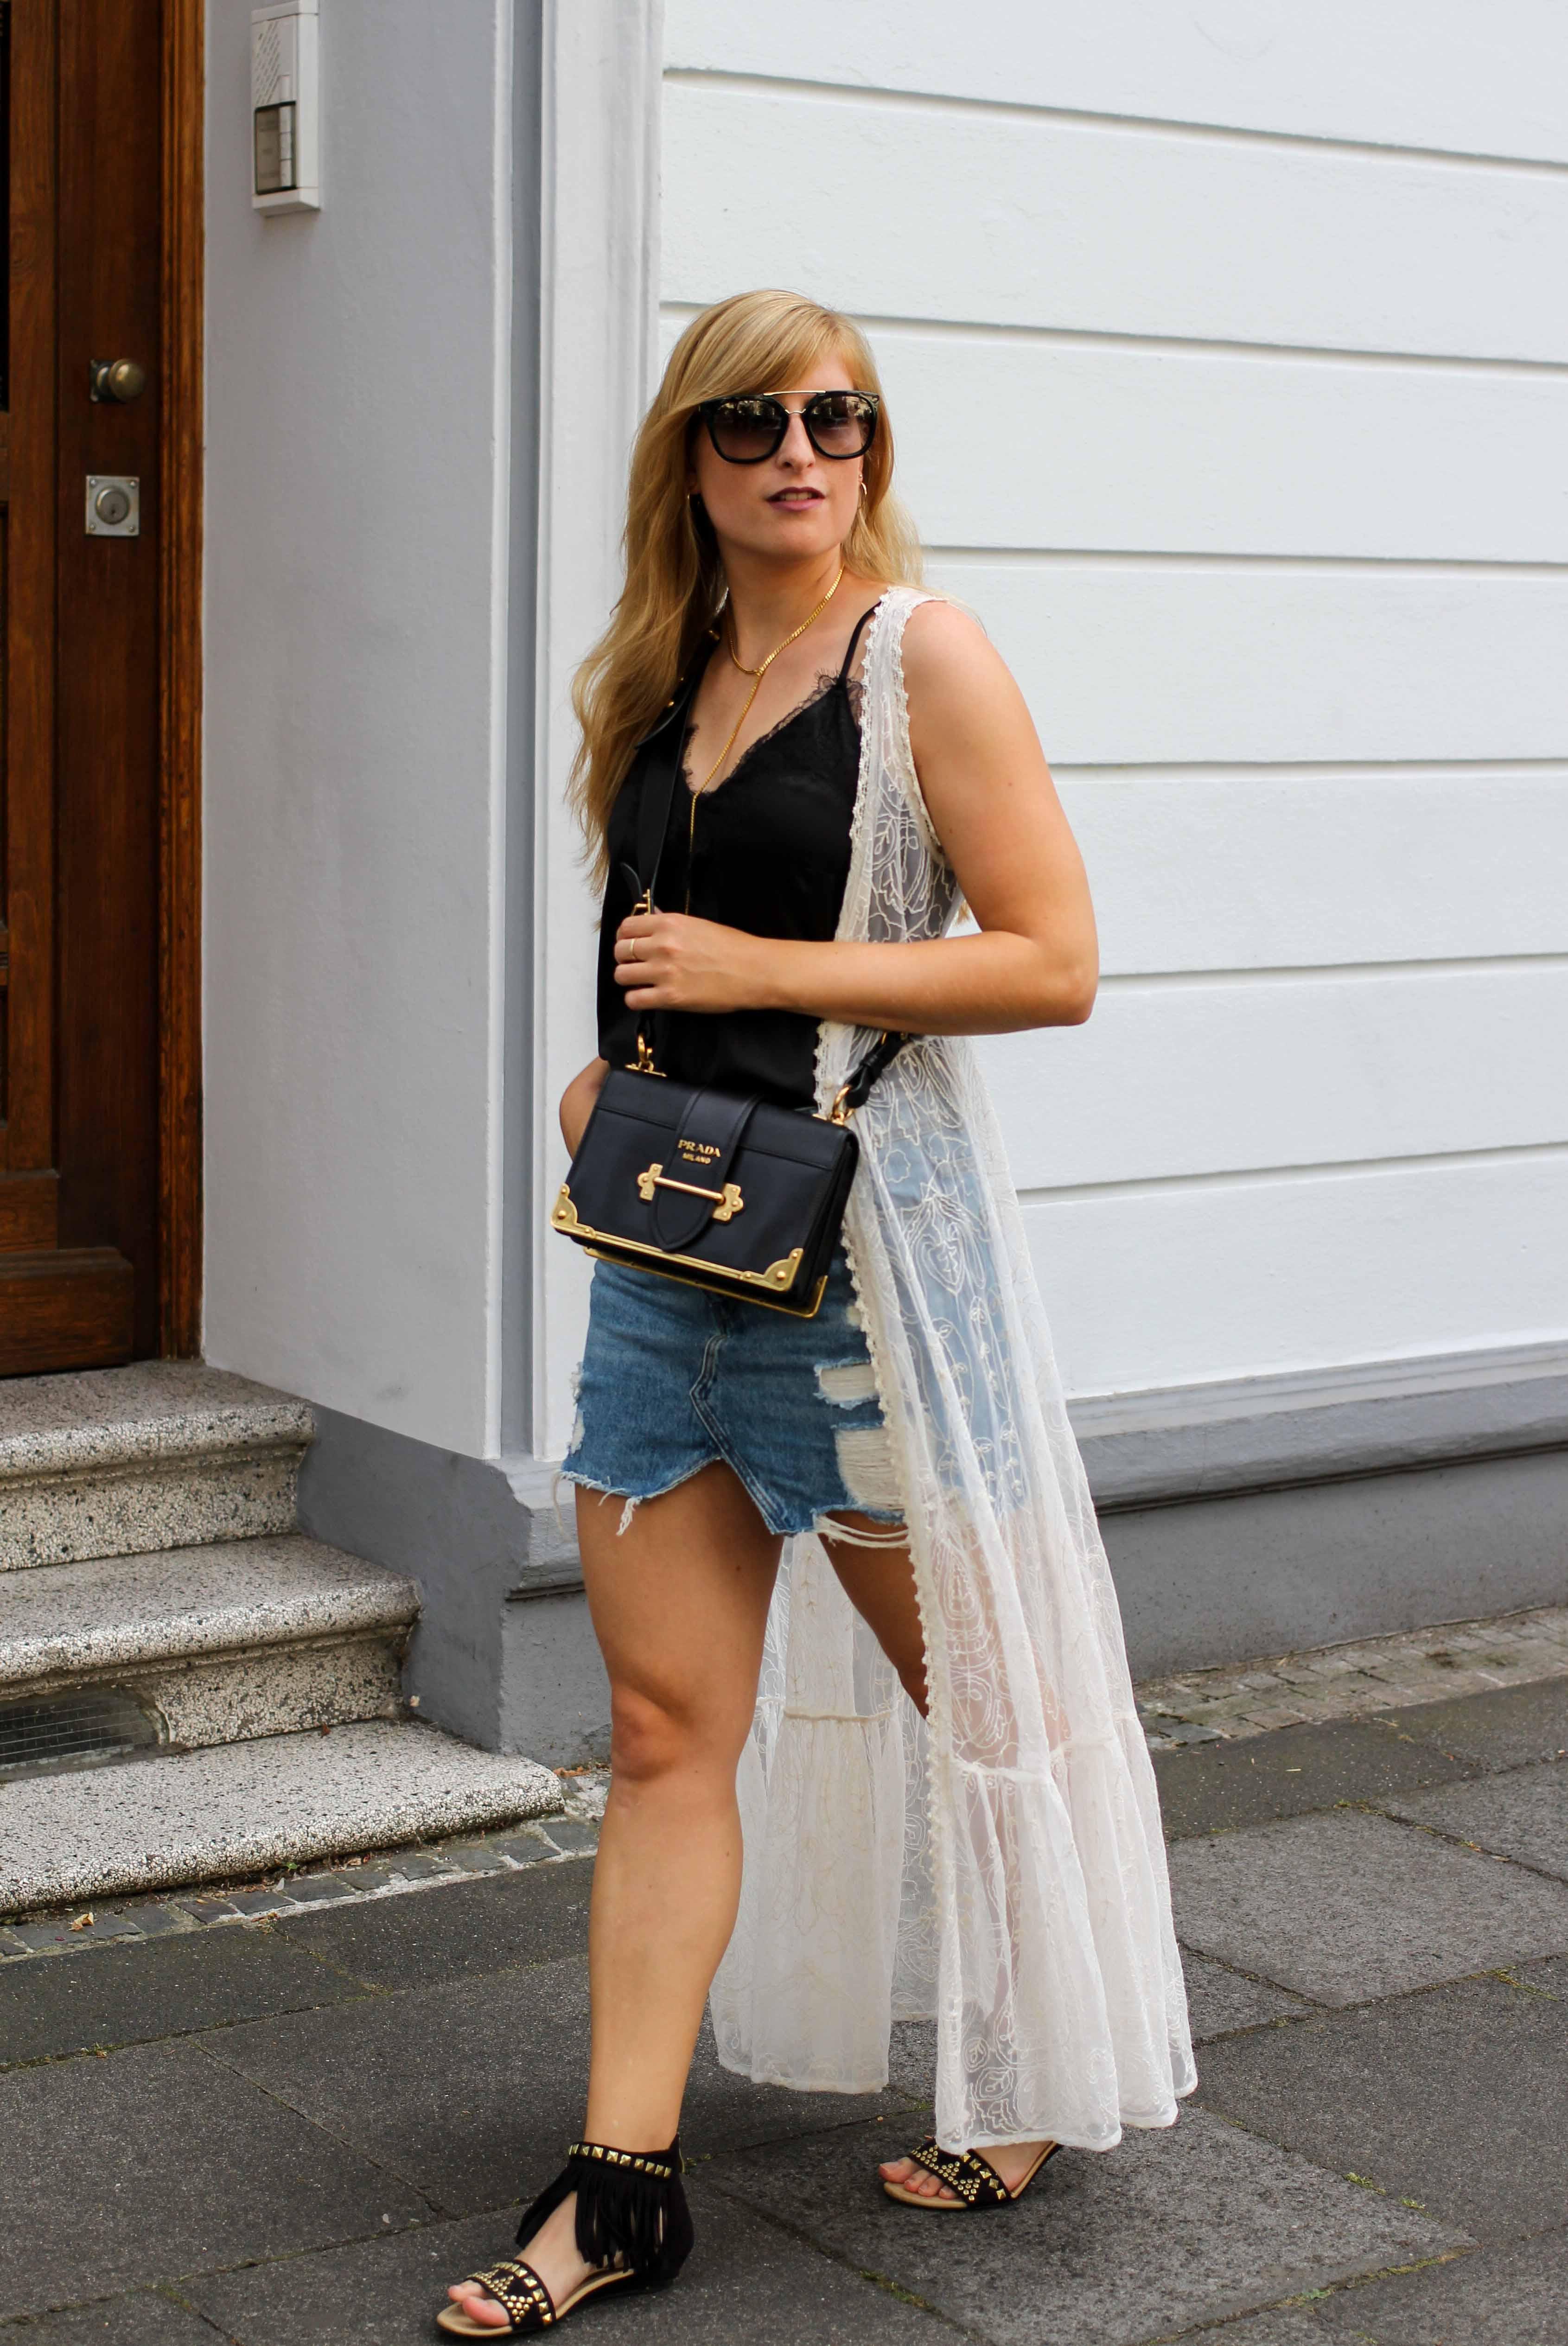 Spitzentop Jeansrock Boho Sommermantel Boho Sommerlook kombinieren Ibiza Style Hippie Modeblog Outfit Prada Cahier Schwarz Gold 9